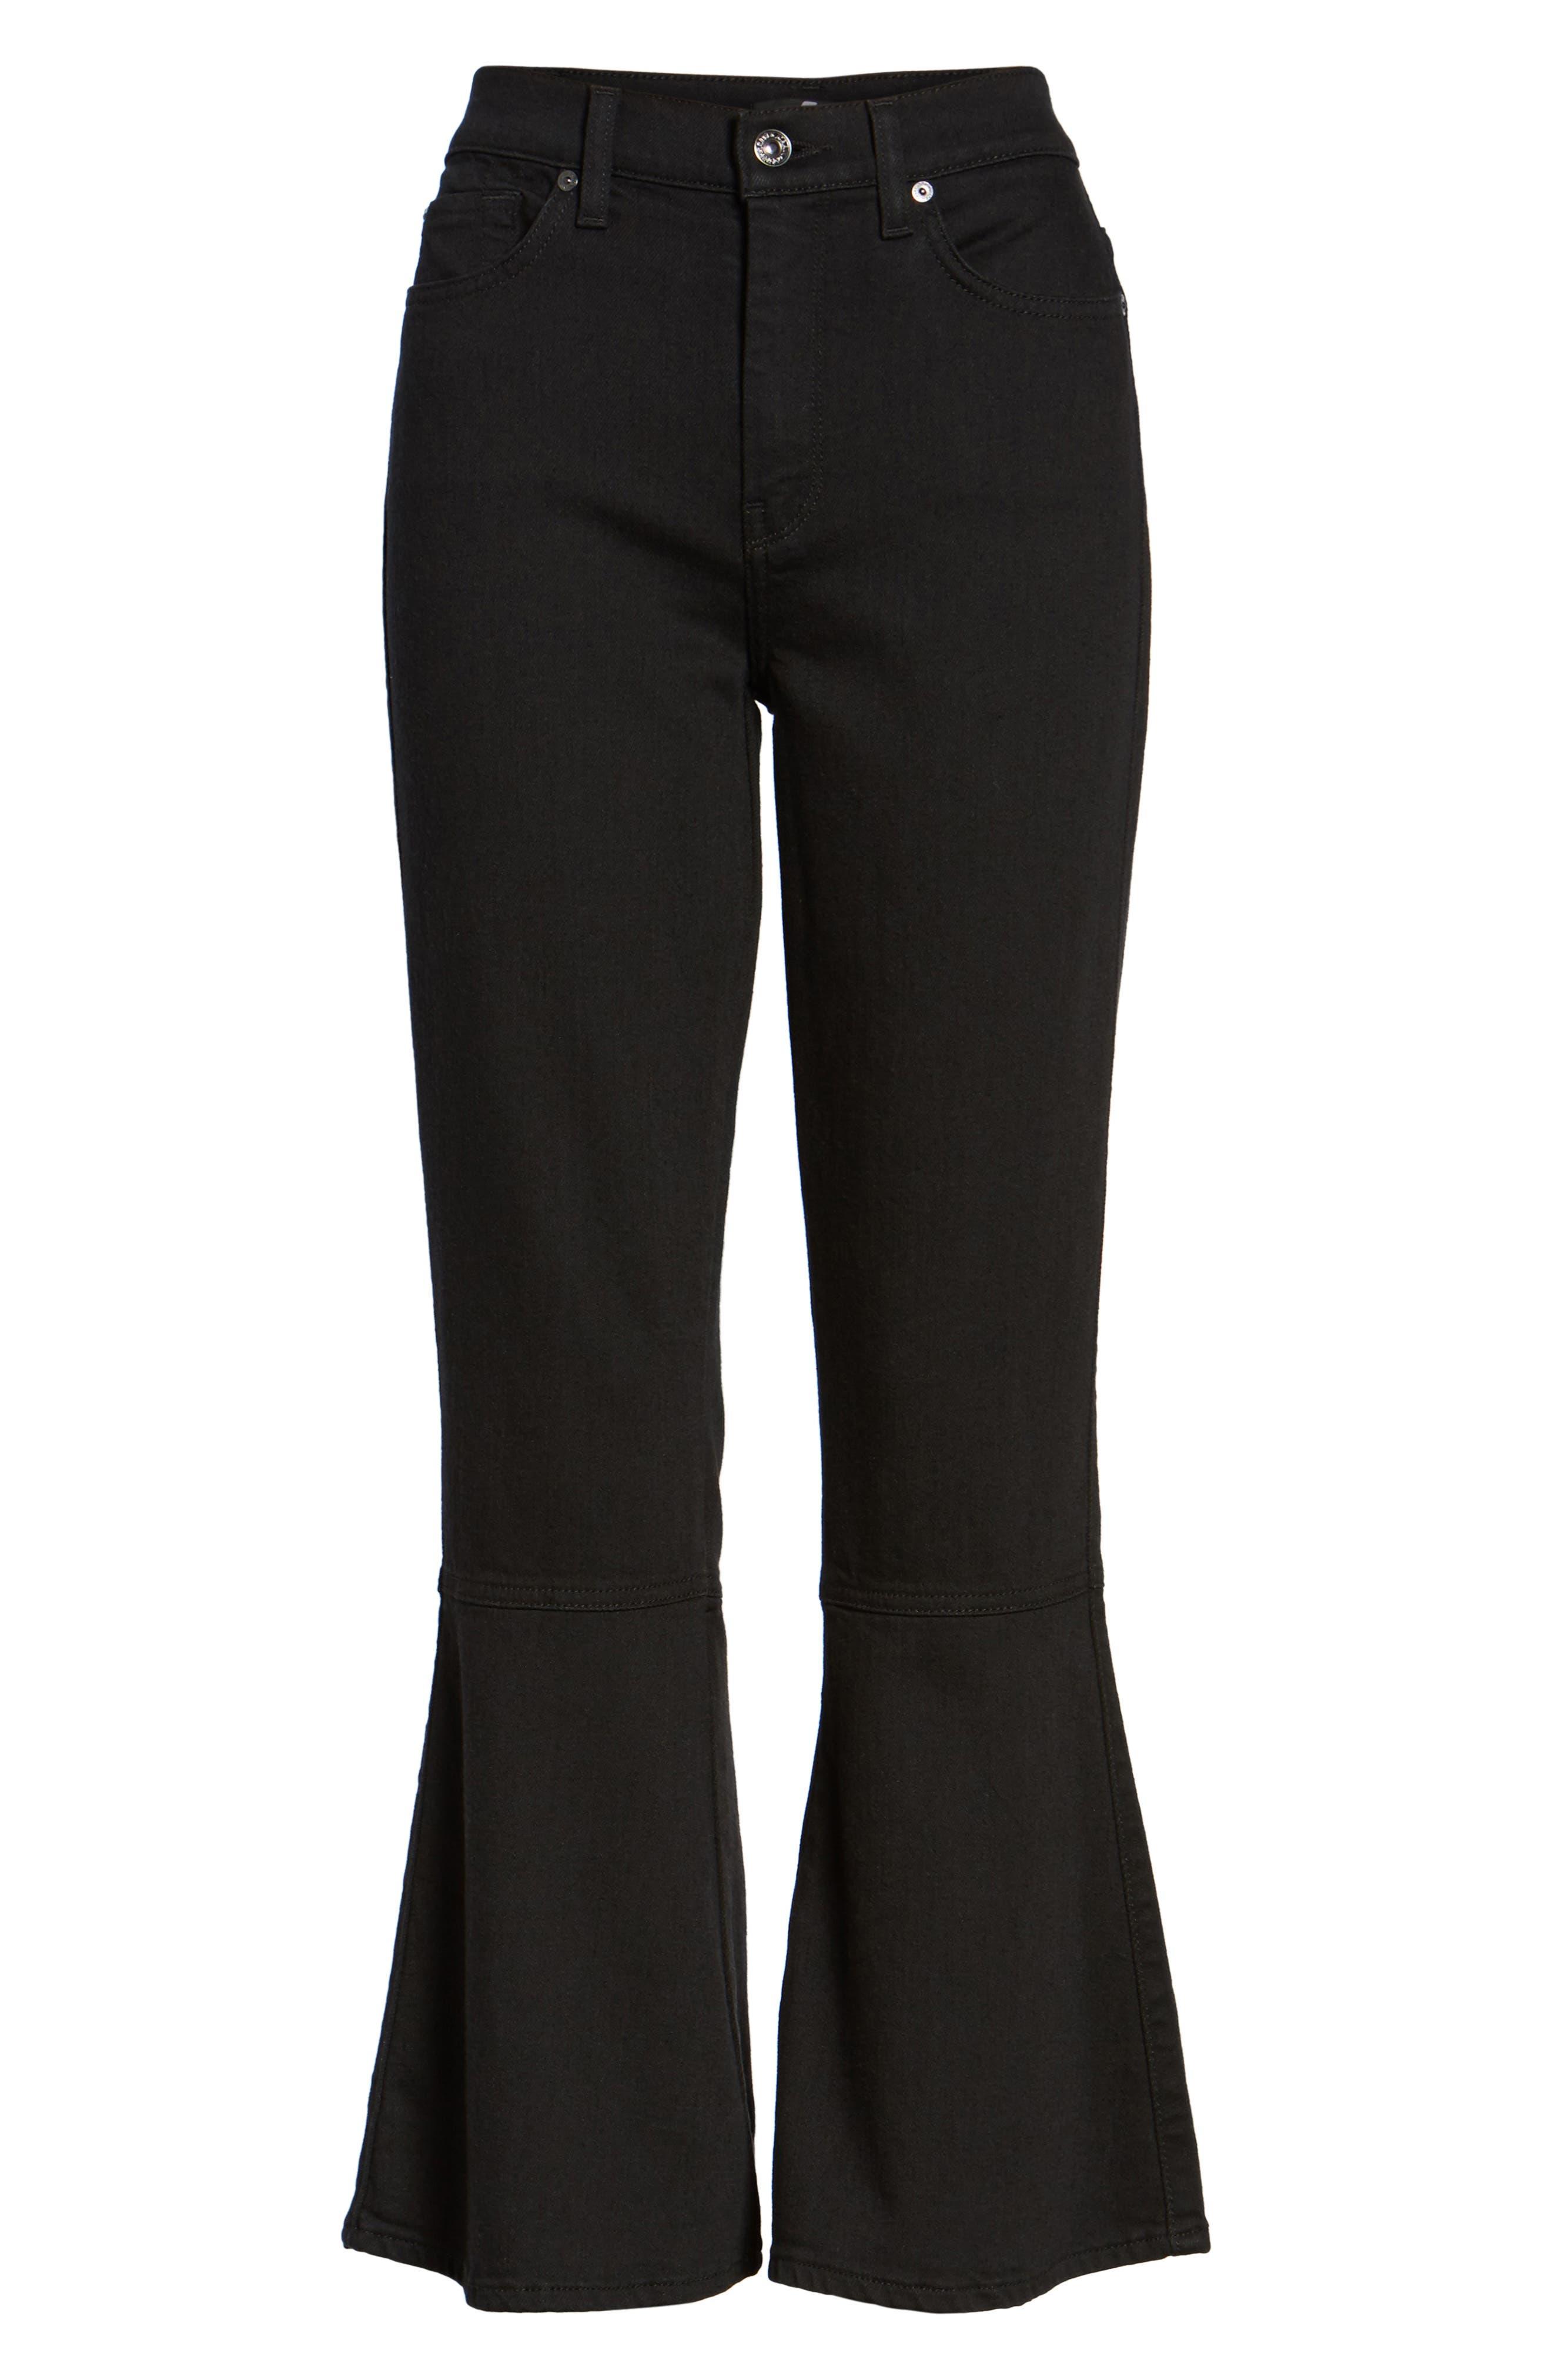 Priscilla High Waist Crop Flare Jeans,                             Alternate thumbnail 6, color,                             Night Black